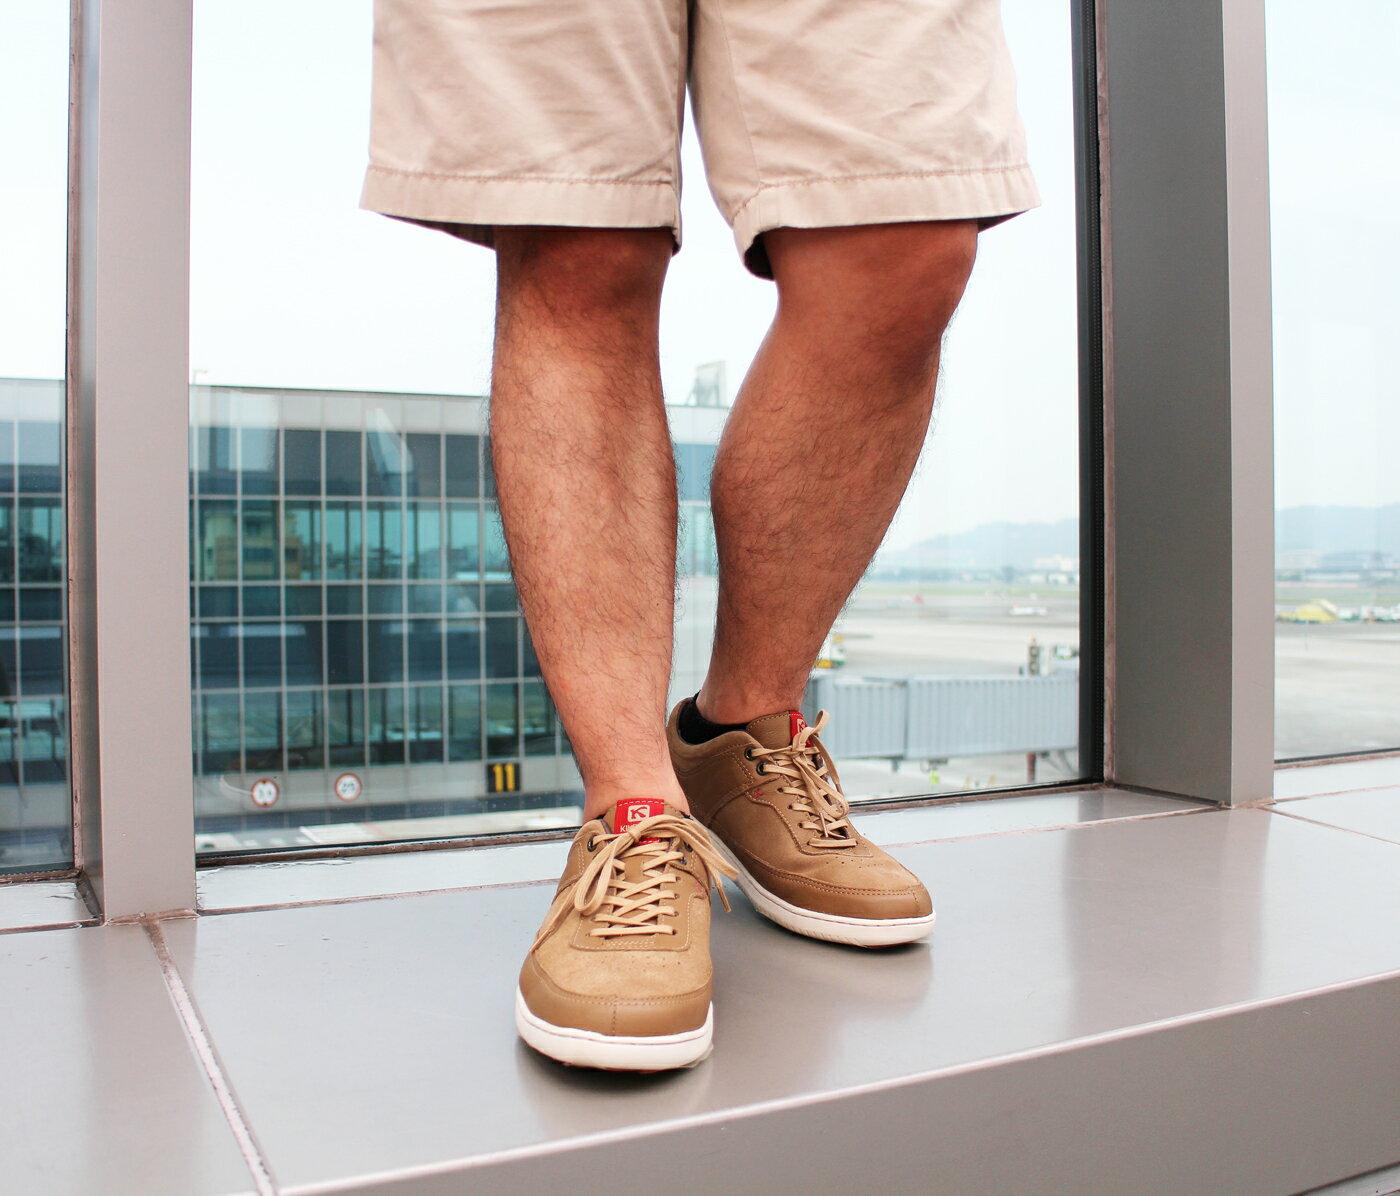 【KILDARE 85折】KILDARE 綁帶休閒鞋 淺咖啡 男 慢跑休閒 2